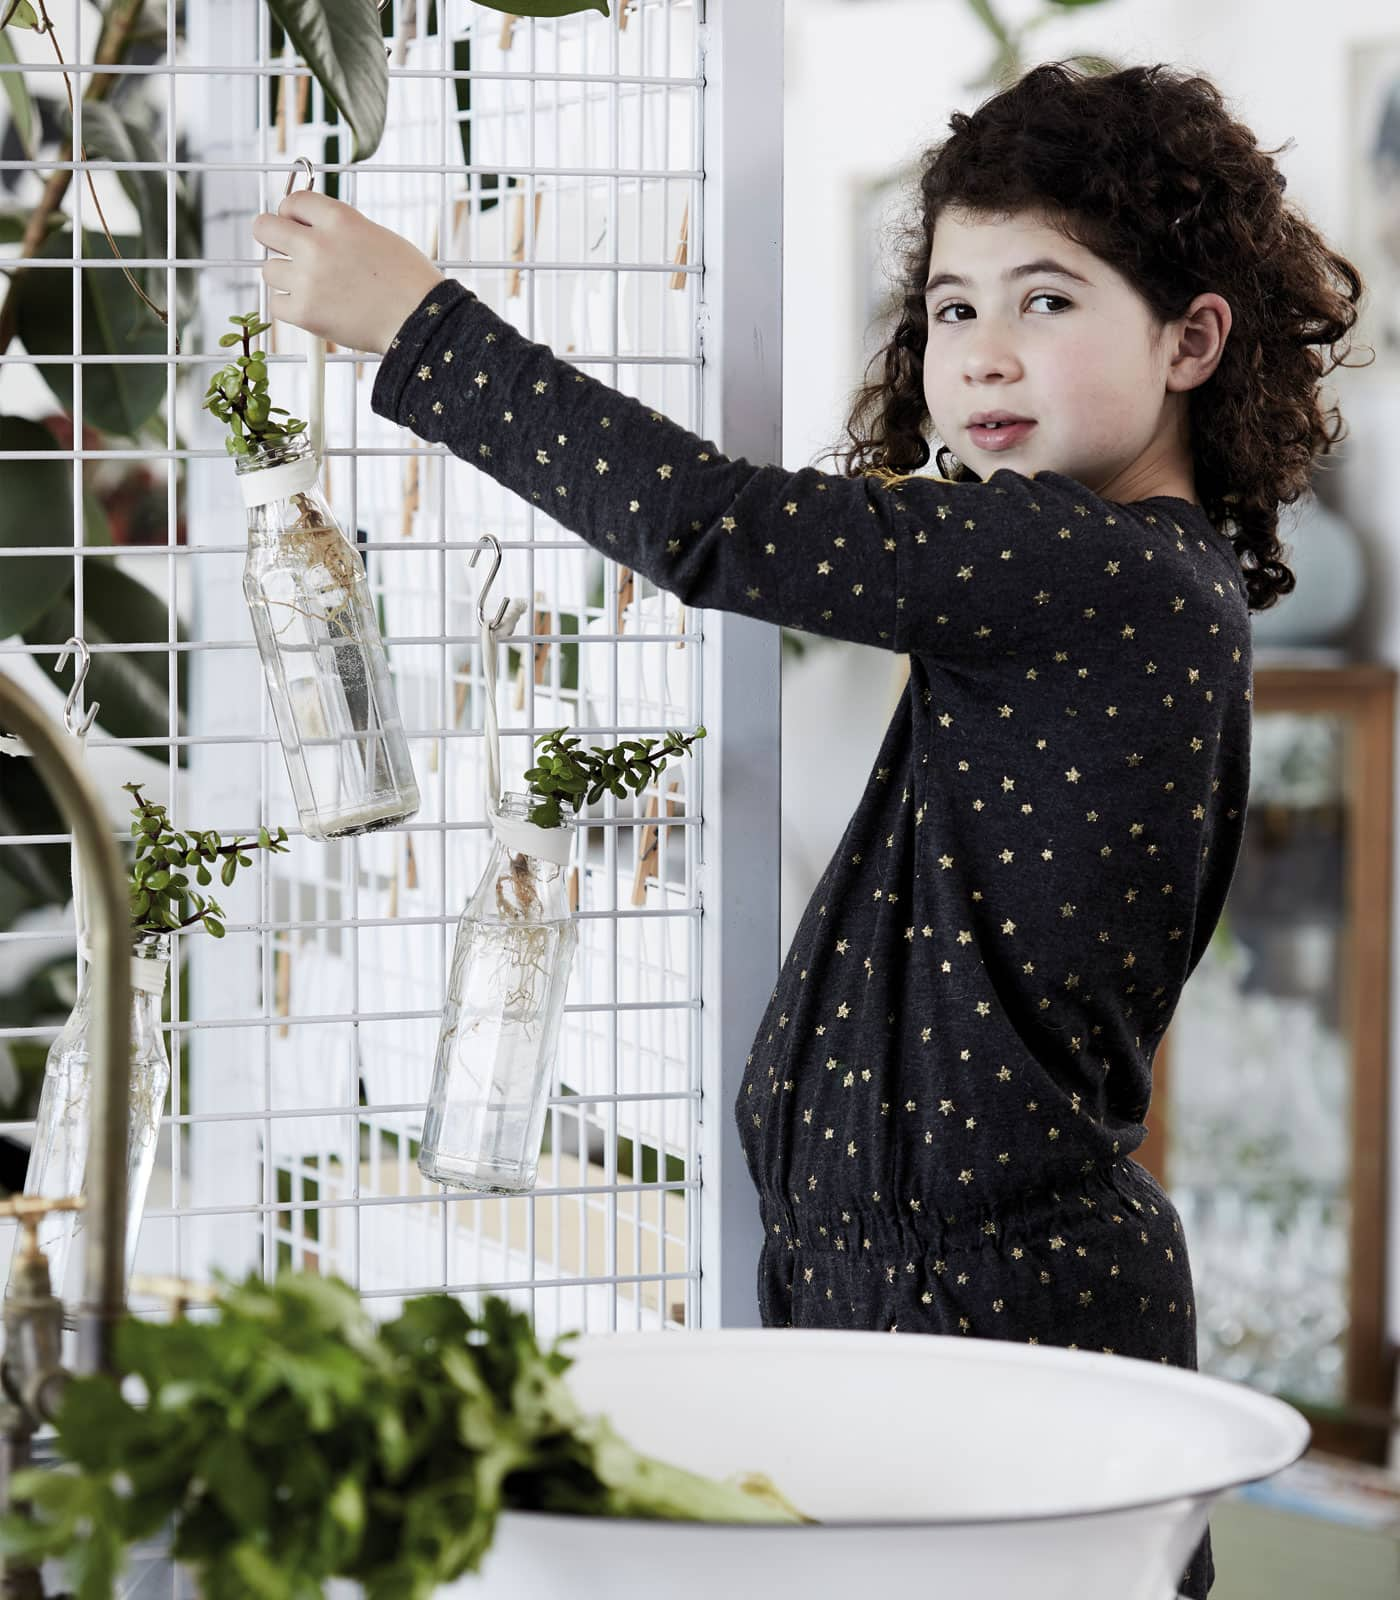 Pflanzen vermehren mit Kindern // HIMBEER